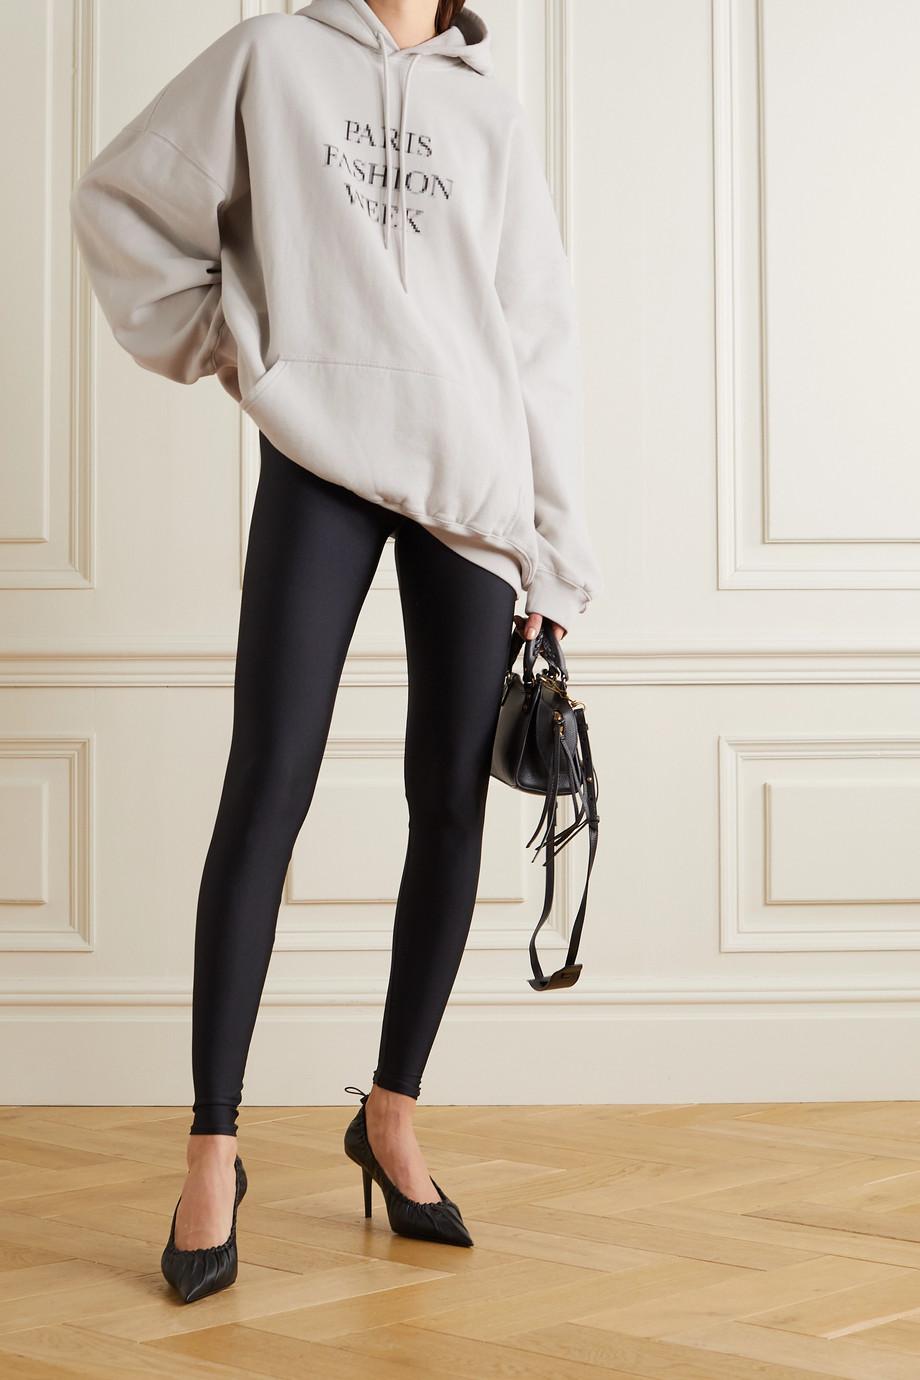 Balenciaga Sweat à capuche en jersey de coton imprimé